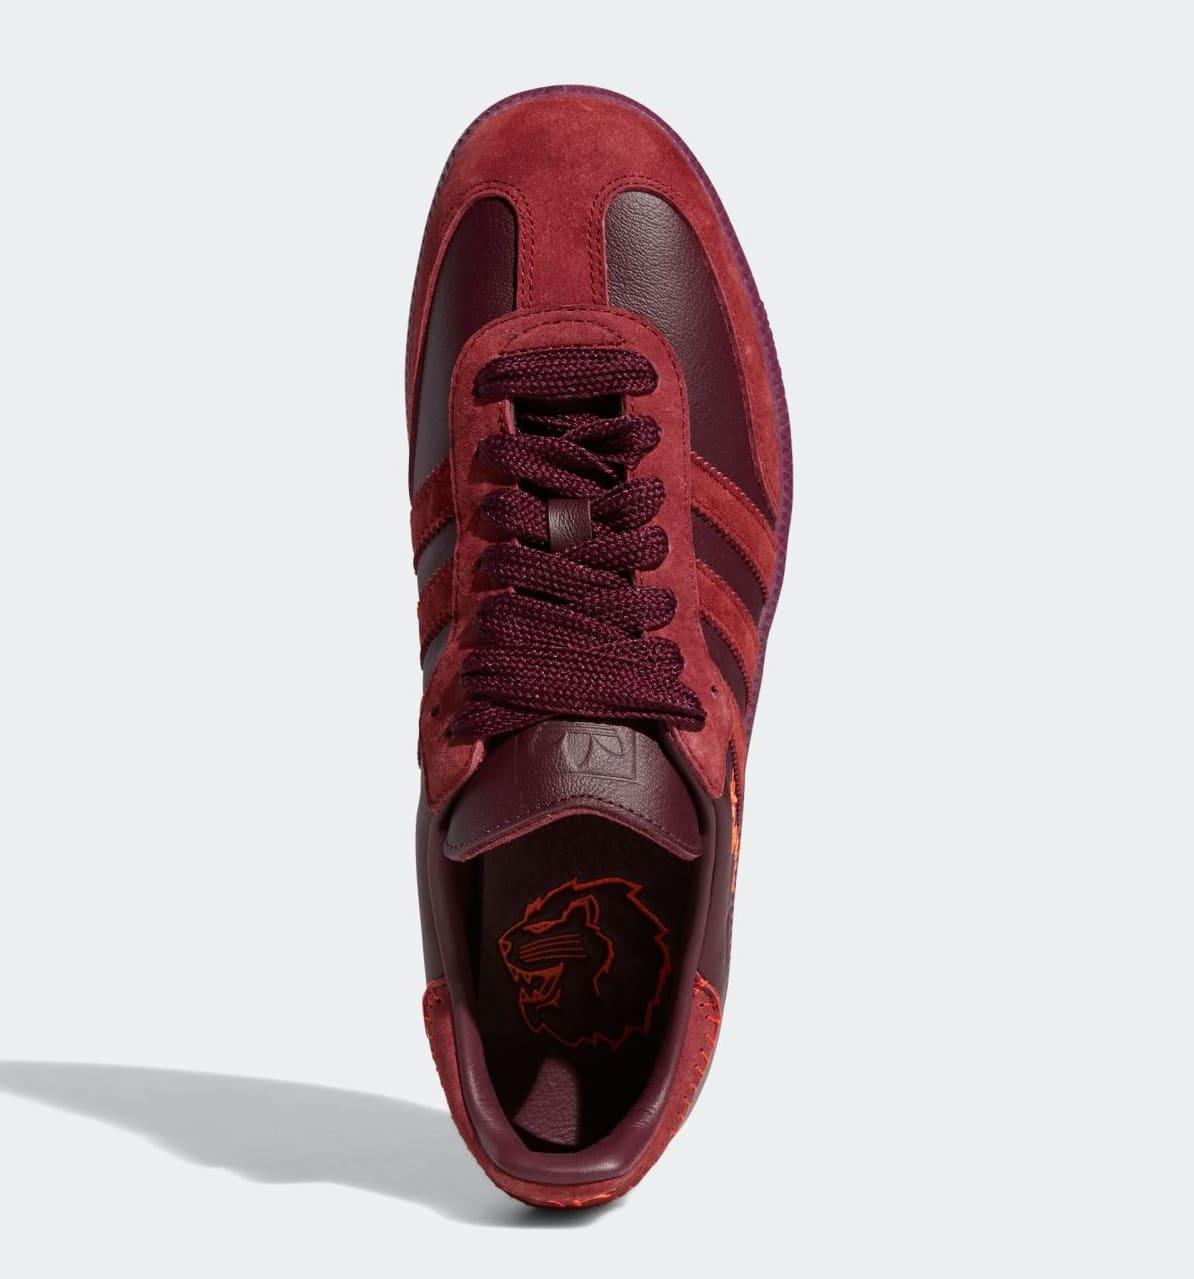 Jonah Hill x Adidas Samba 'Burgundy' FW7456 Top